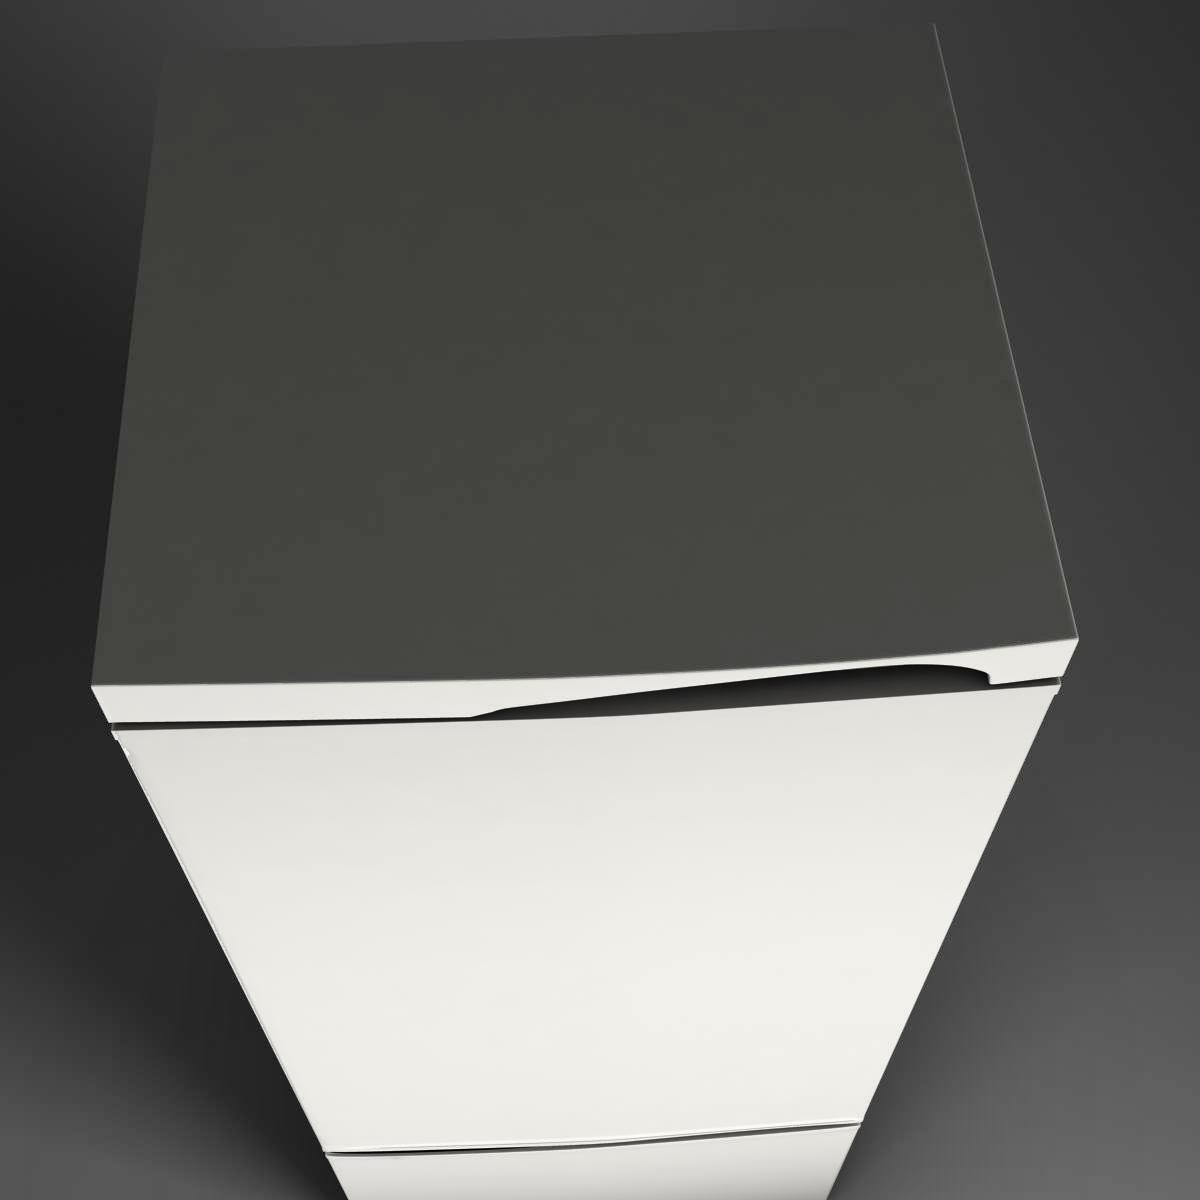 fridge 3d model 3ds max fbx ma mb obj 158909